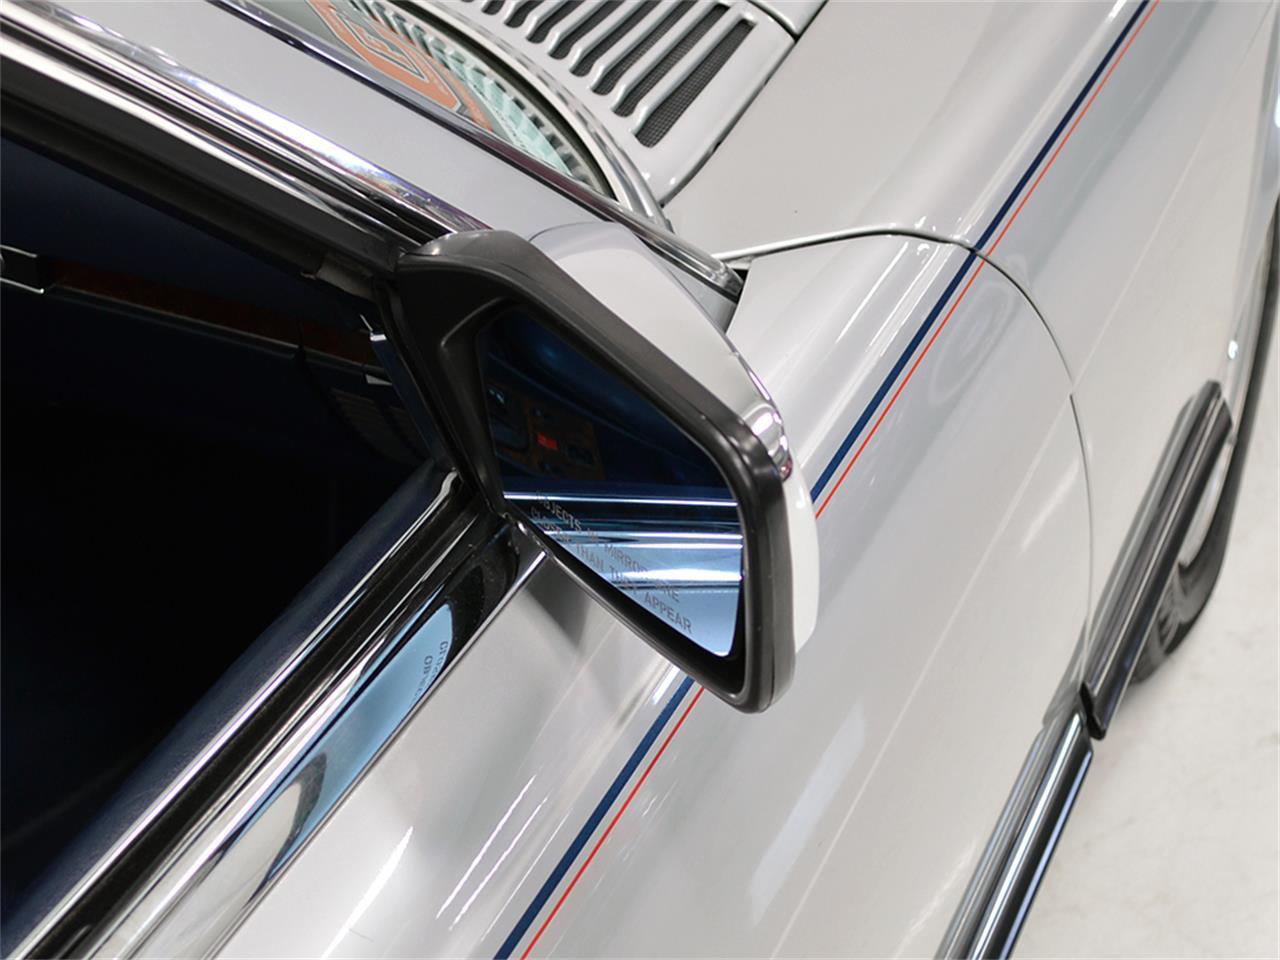 Large Picture of 1984 Mercedes-Benz 380SL Offered by Harwood Motors, LTD. - KA2F